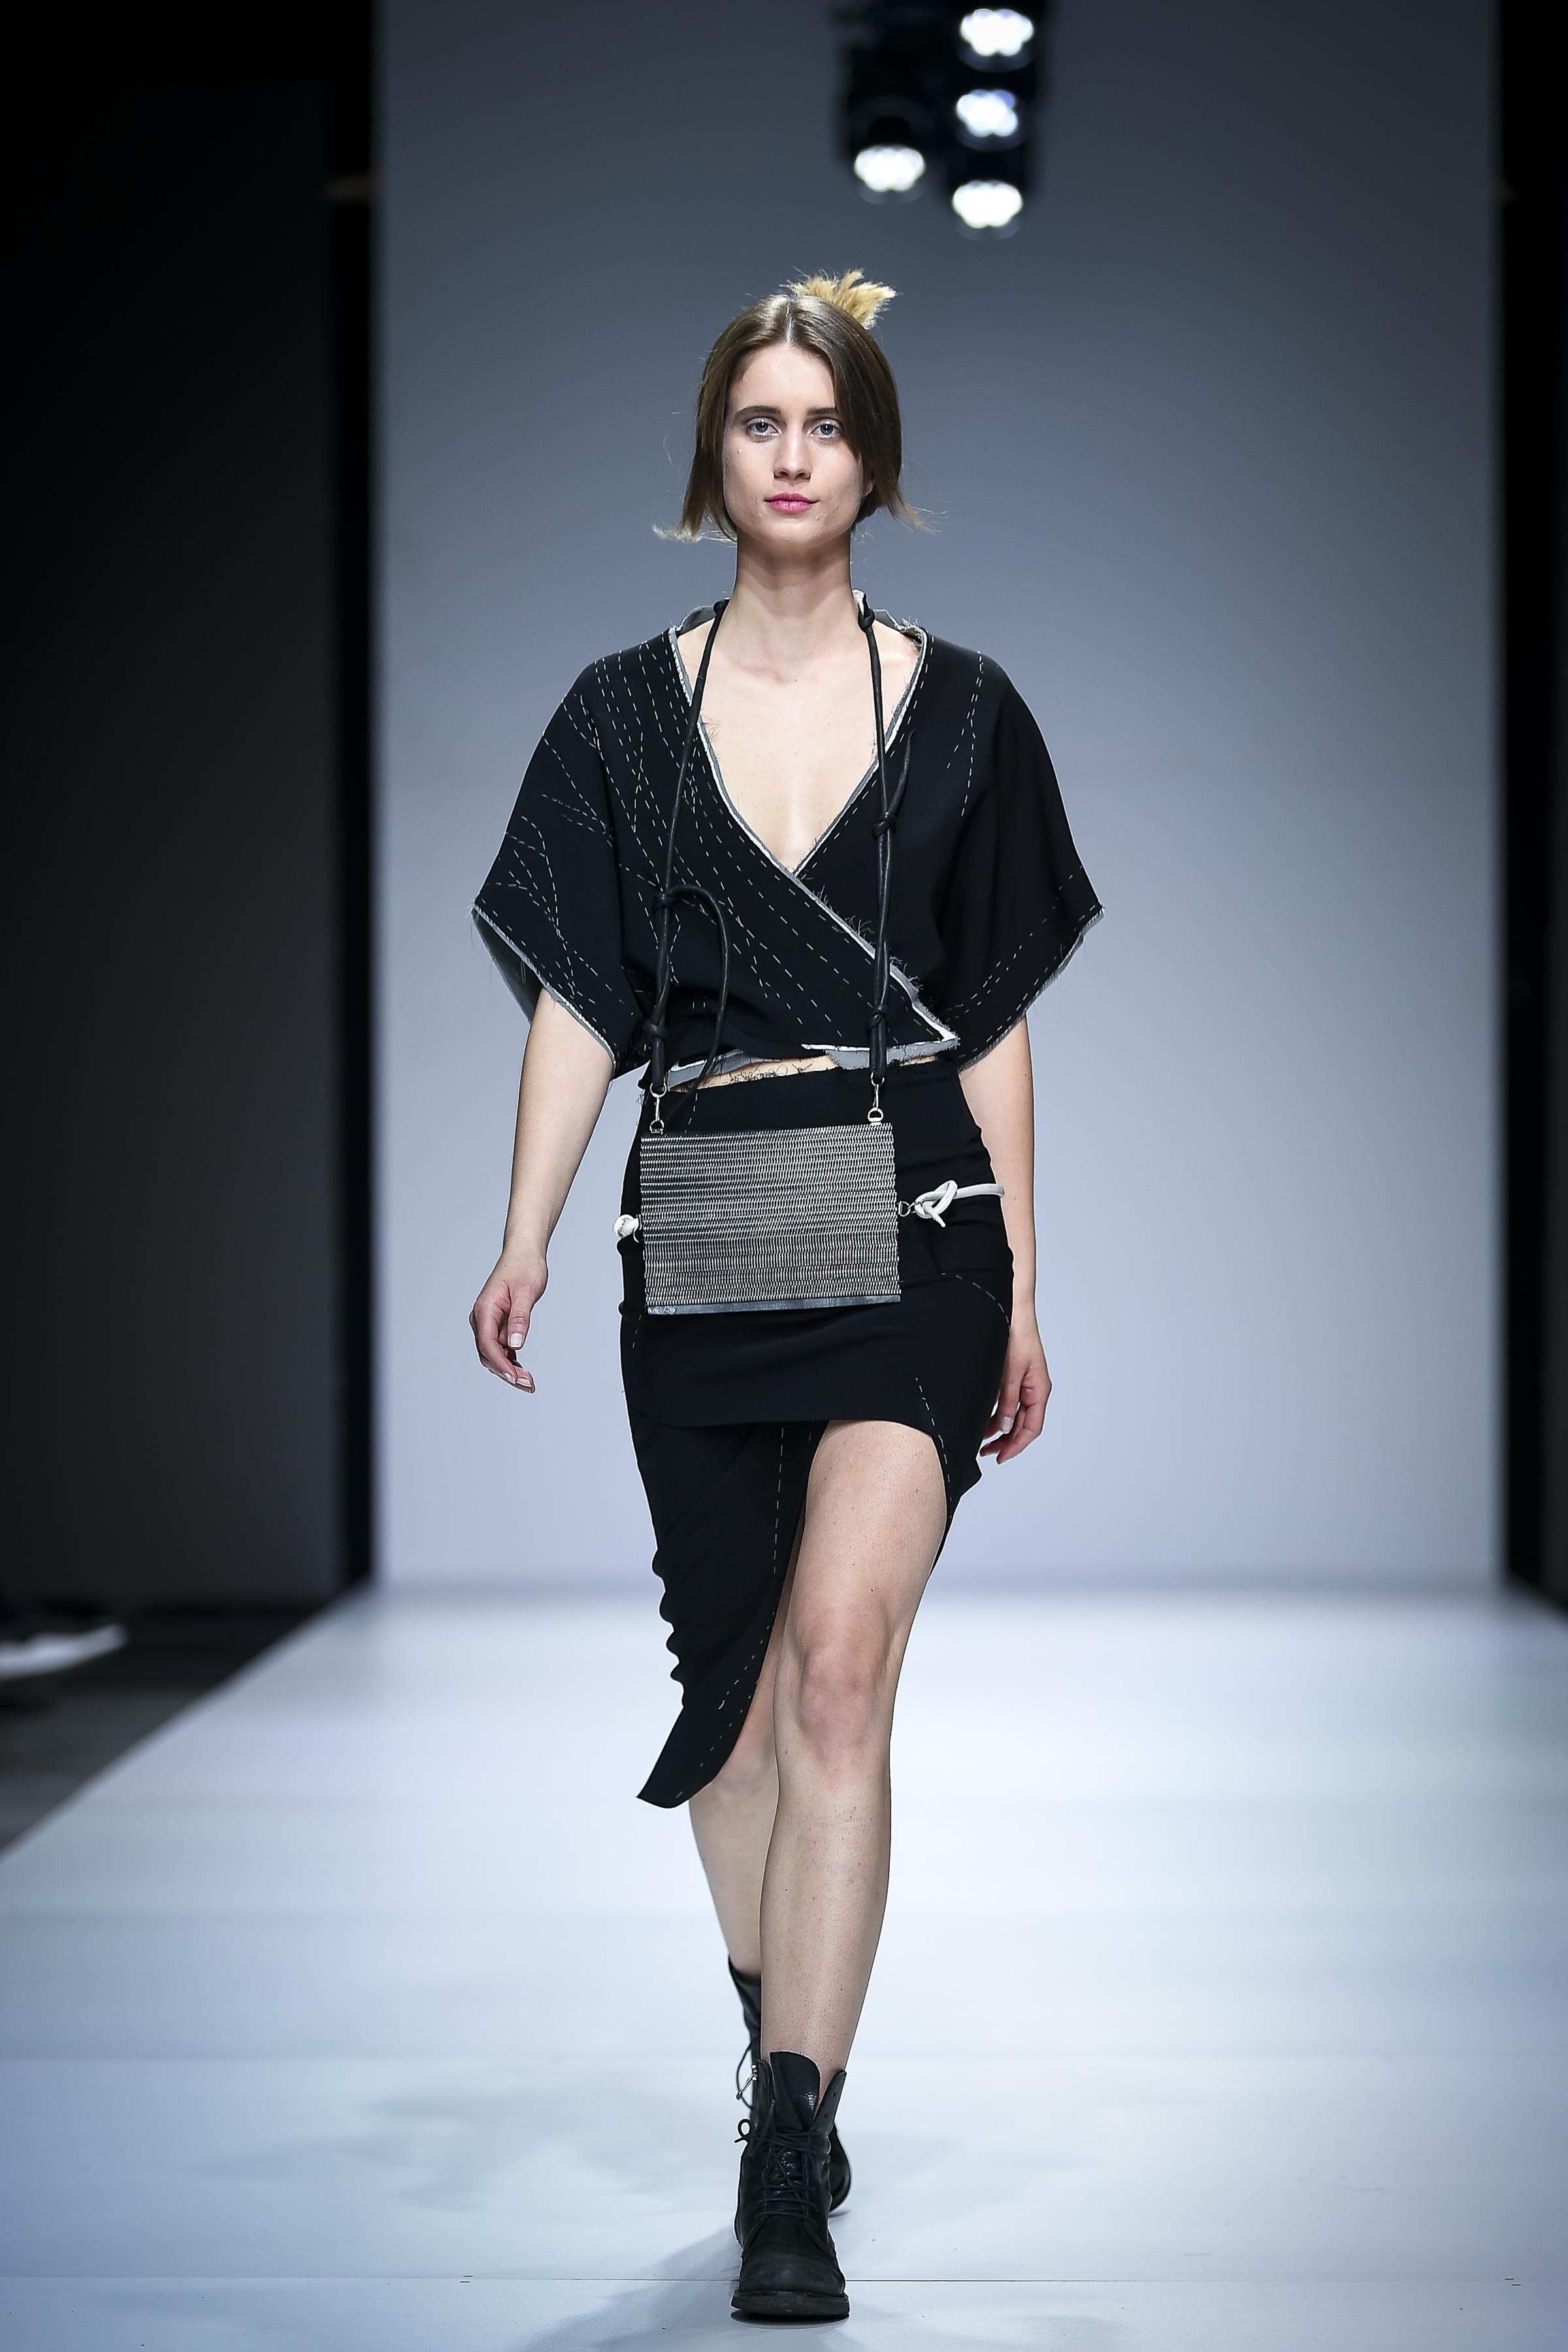 LJFW apr19 Day1 photoJureMakovec 260 Gala Borović pobednica Fashion Scout SEE konkursa